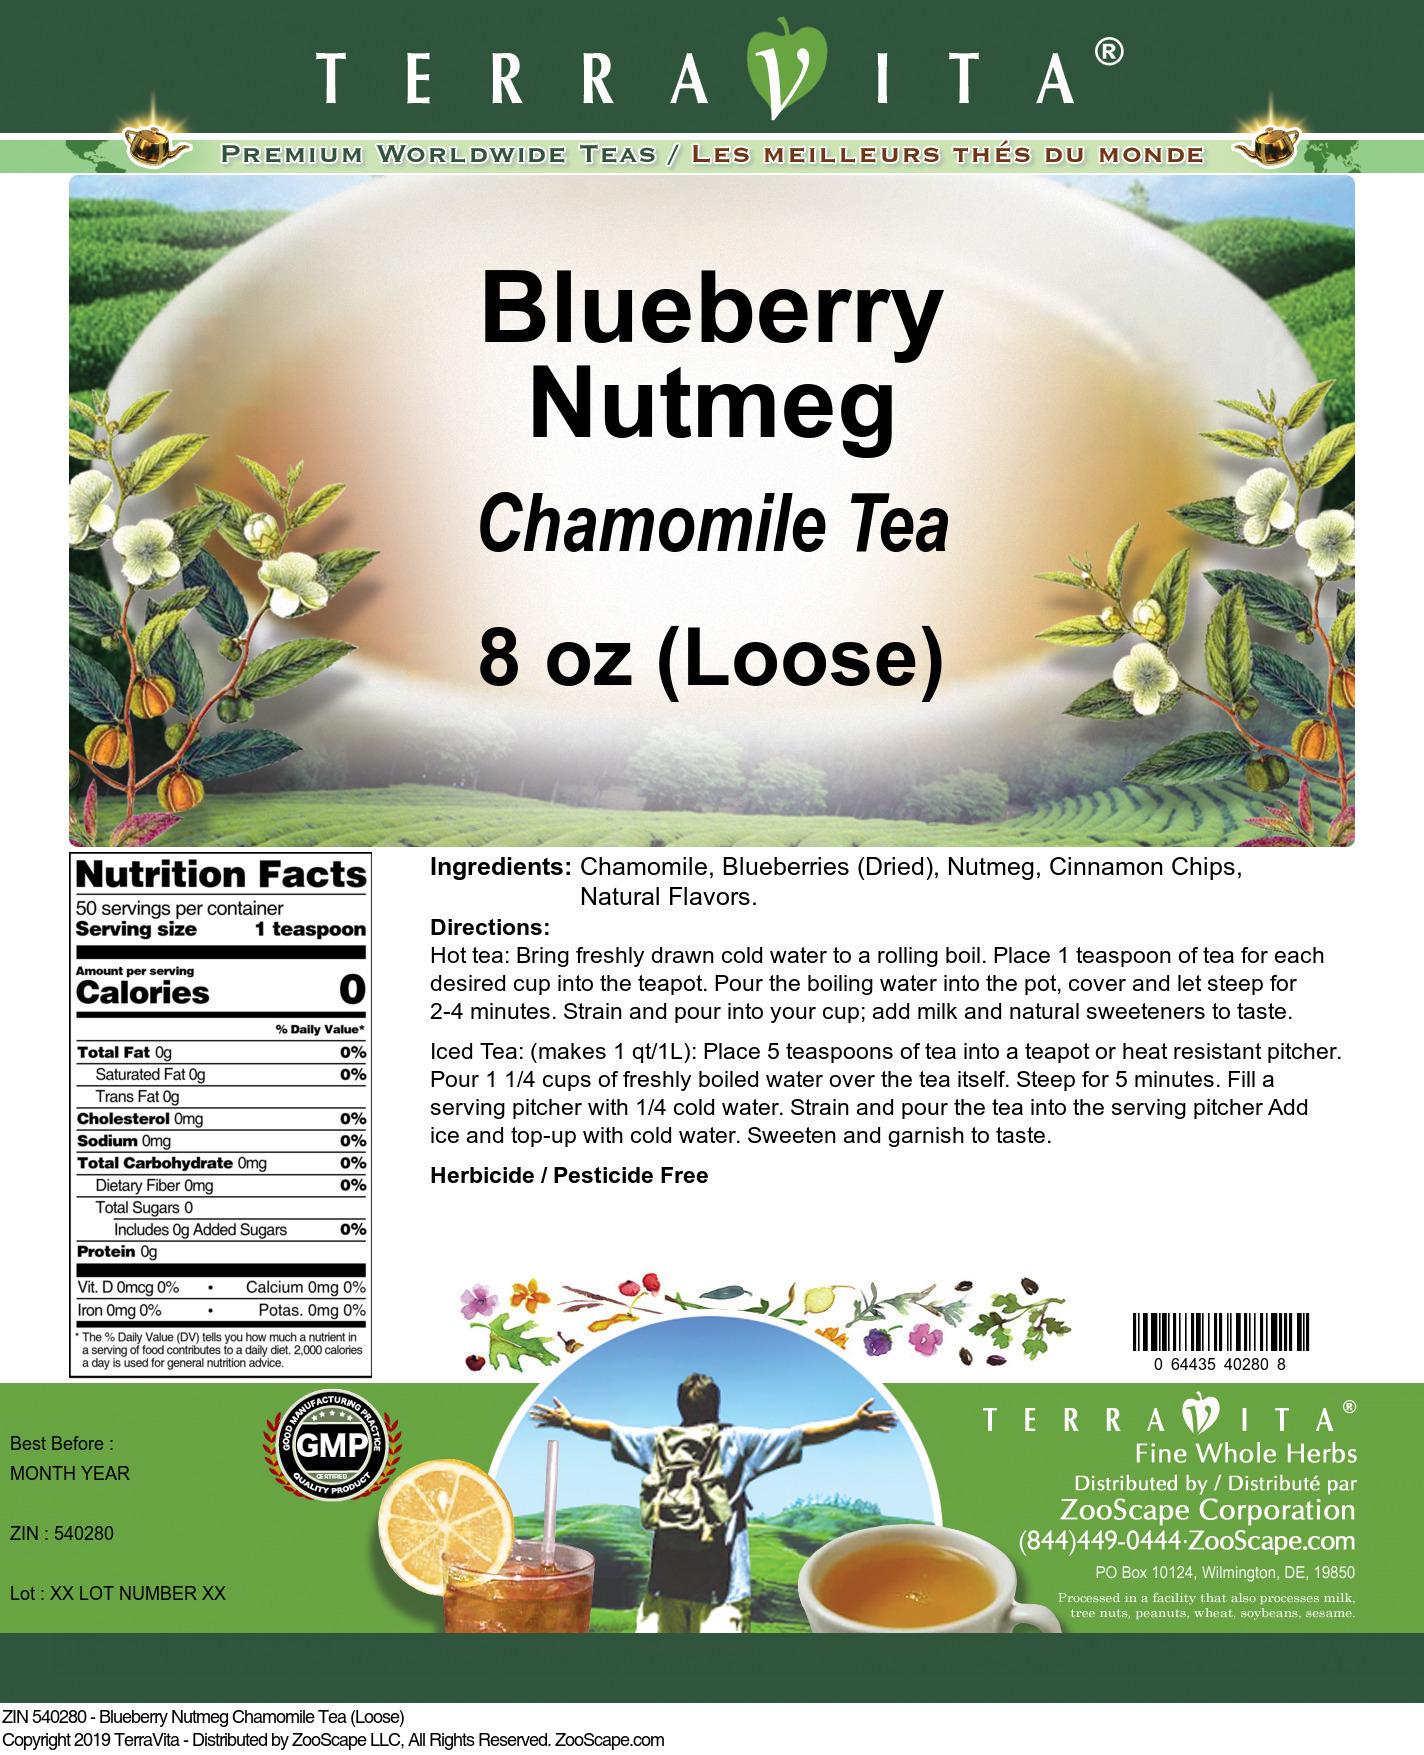 Blueberry Nutmeg Chamomile Tea